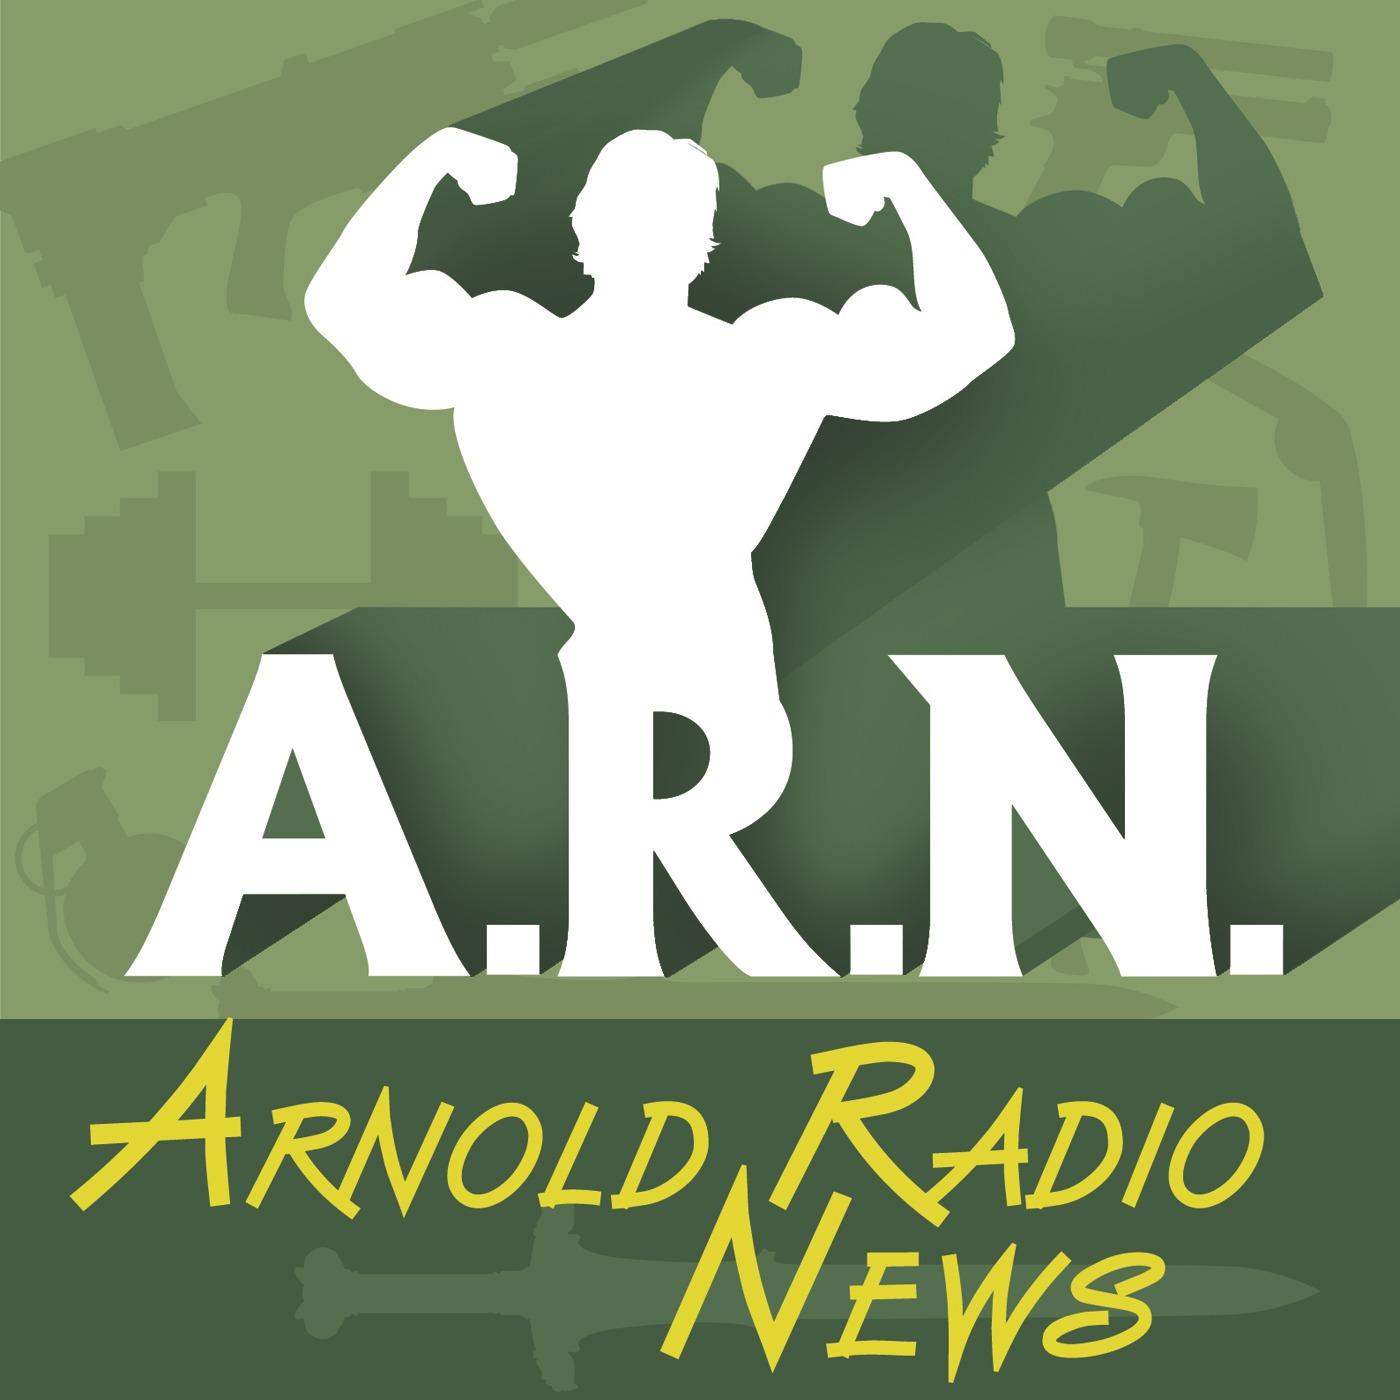 Arnold Radio News